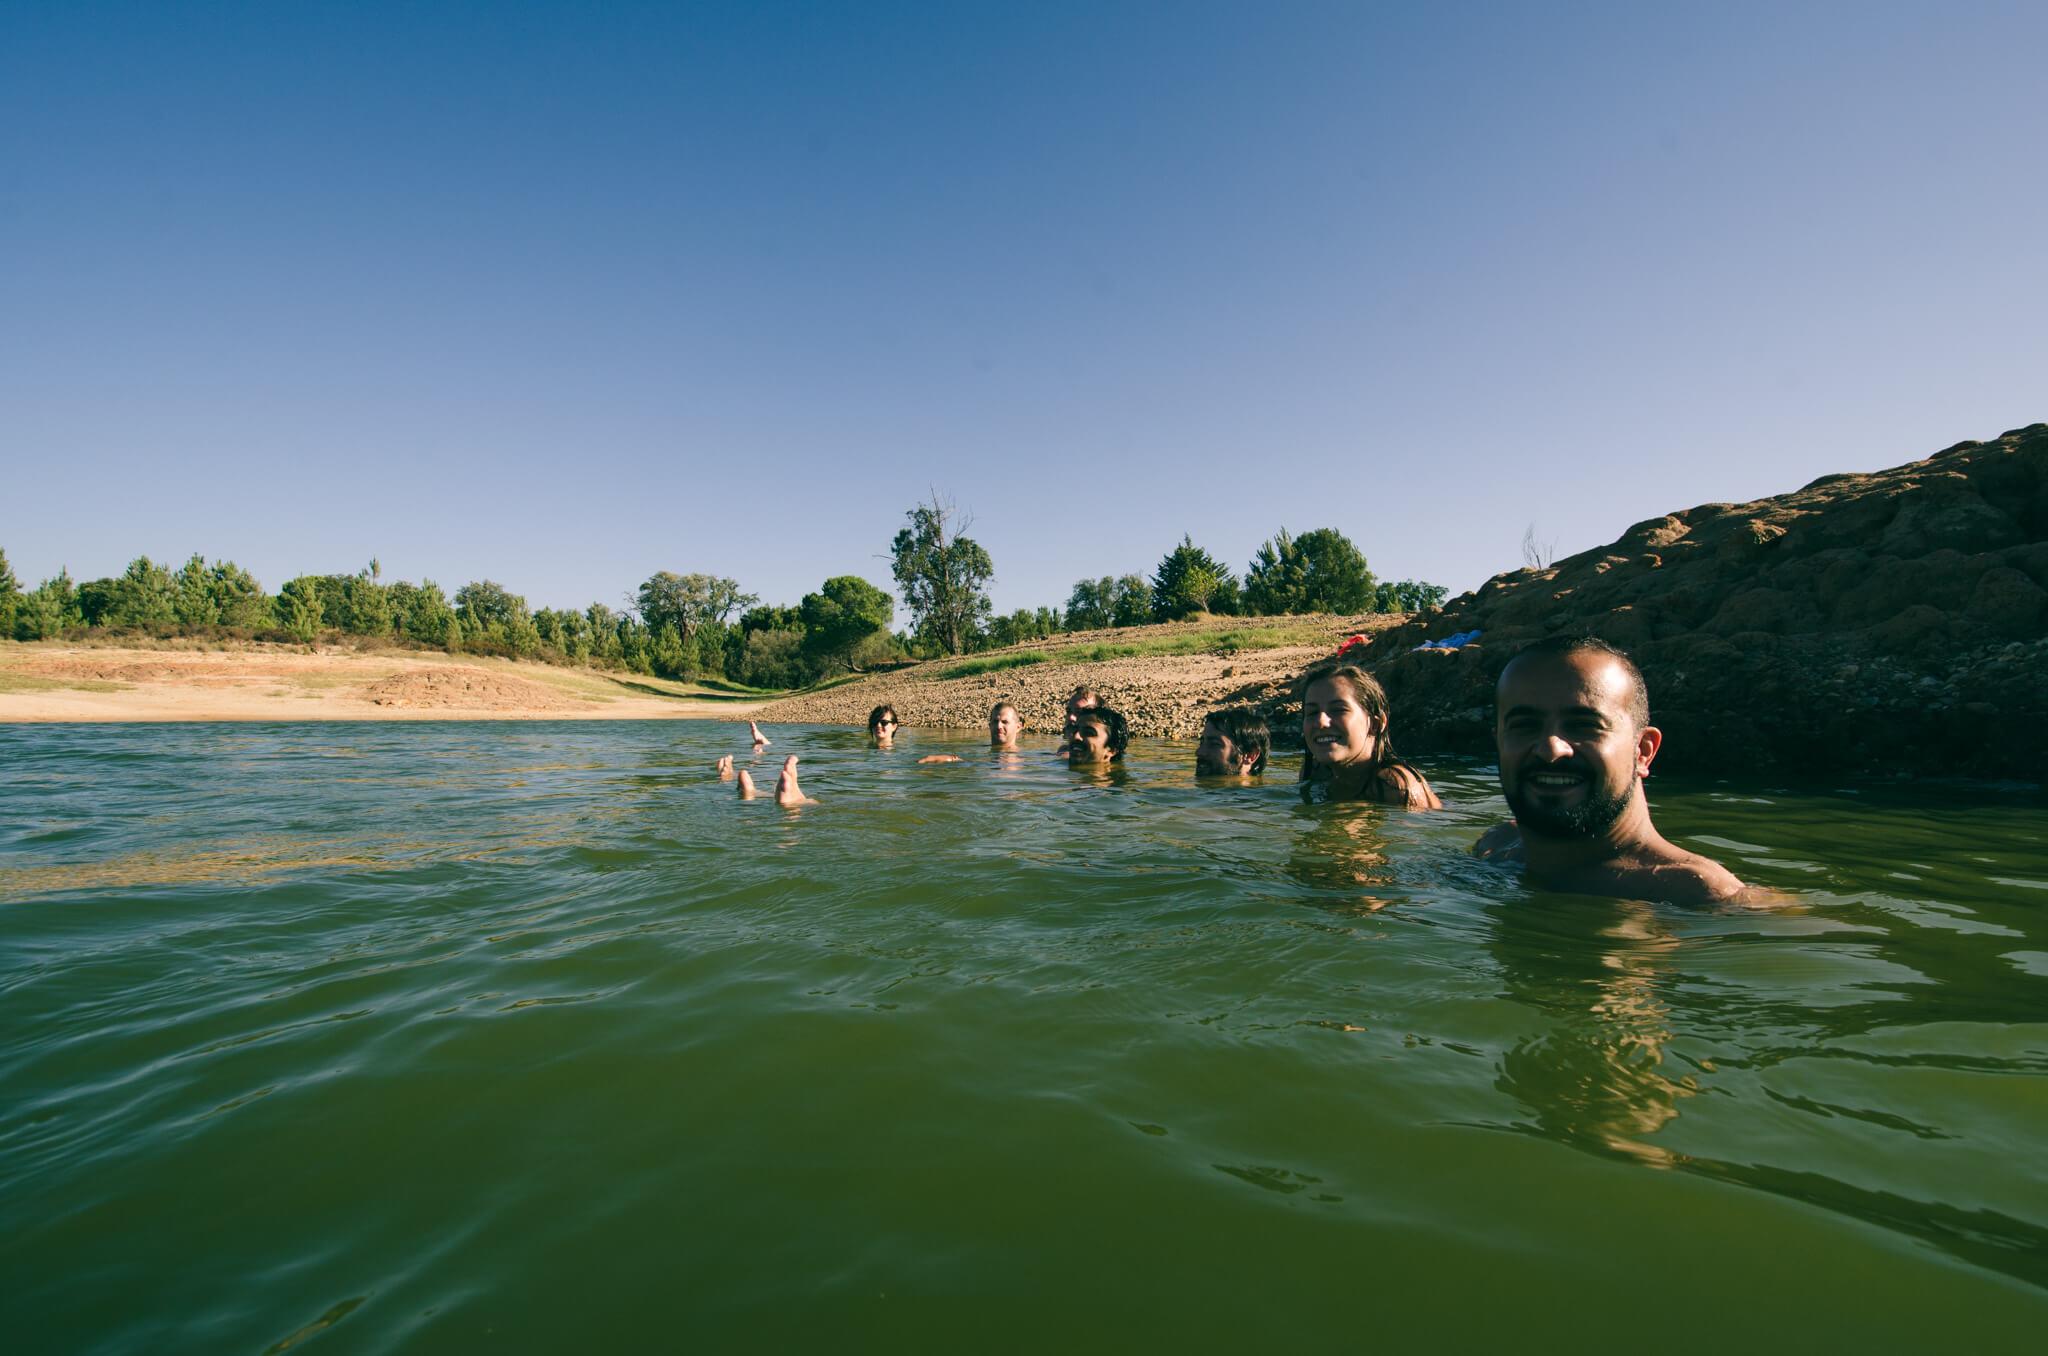 chilling-in-the-lake-breathe-portugal.jpg